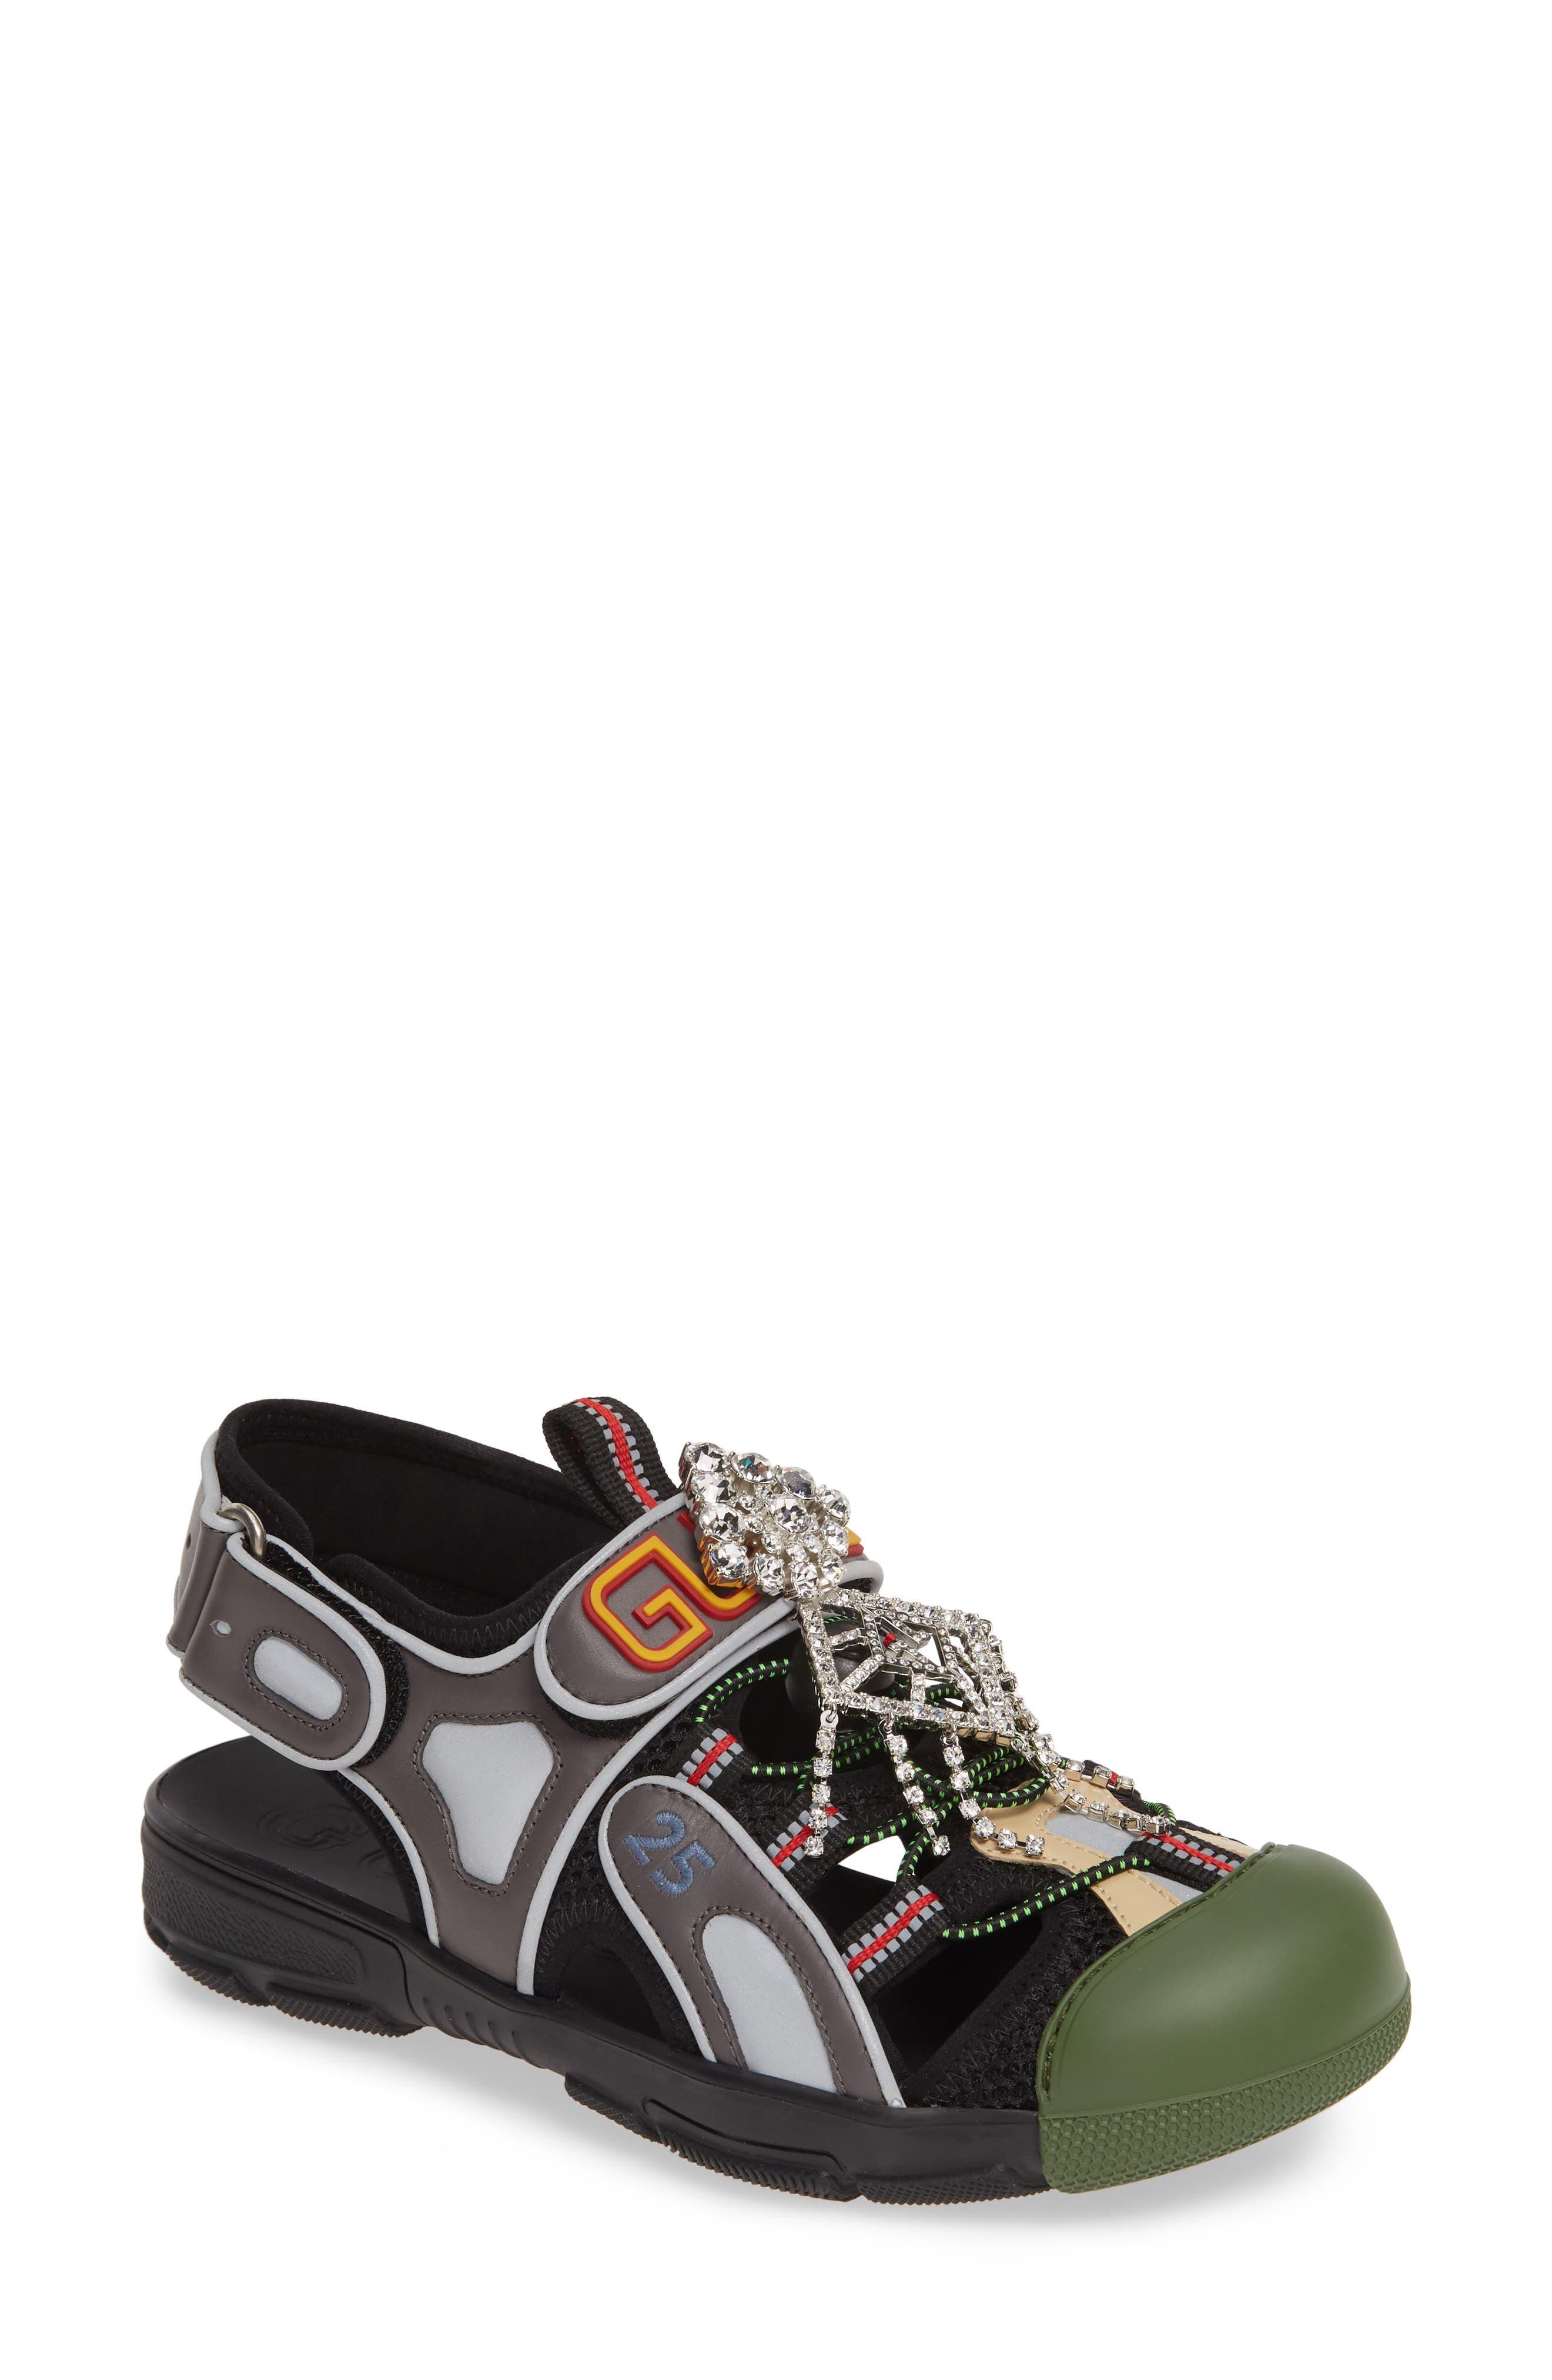 b94ad4b23d9f Designer Sandals for Women